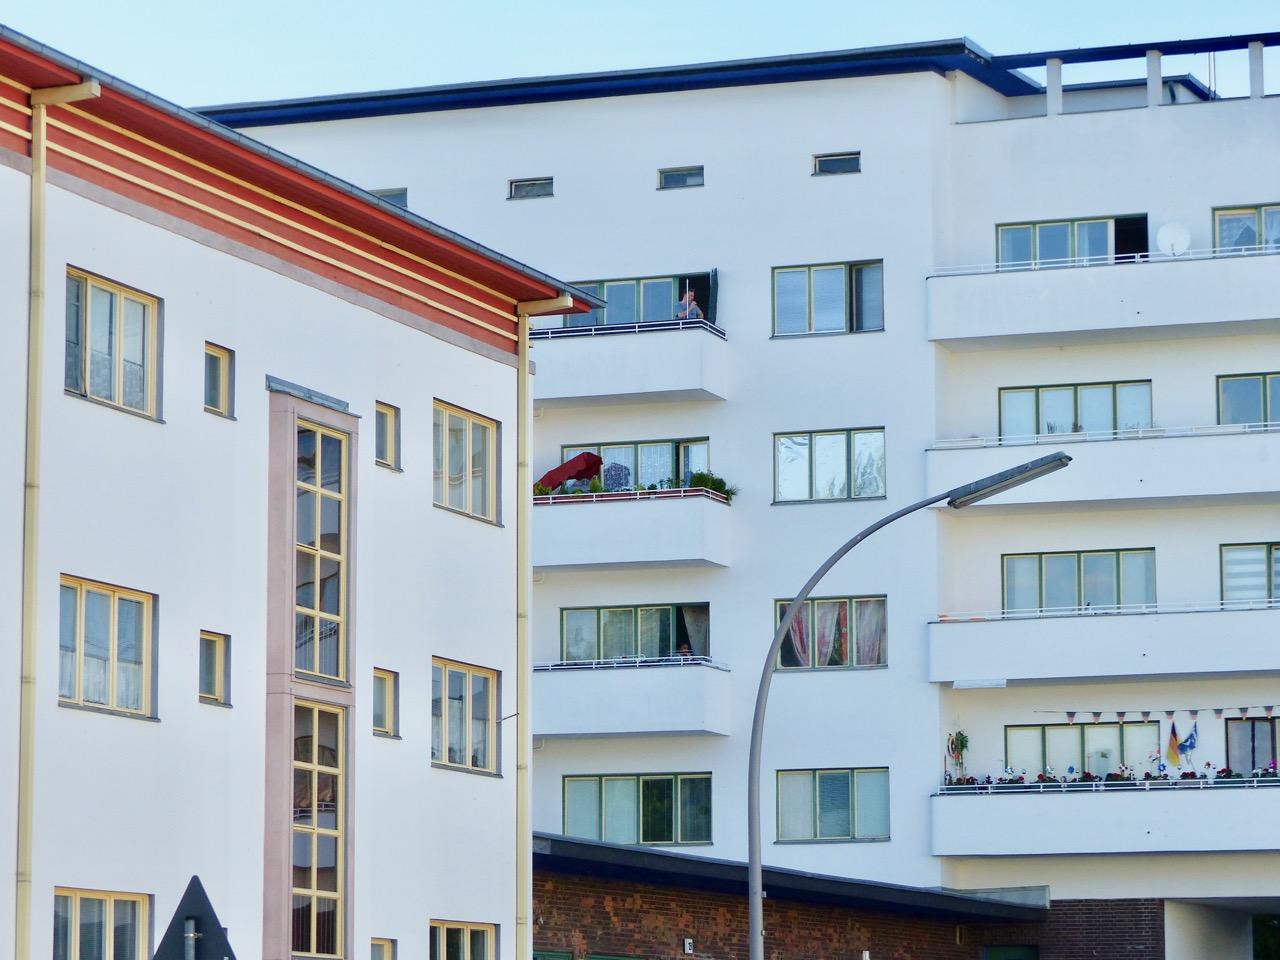 Wohnung berlin erlebnis Maisons closes